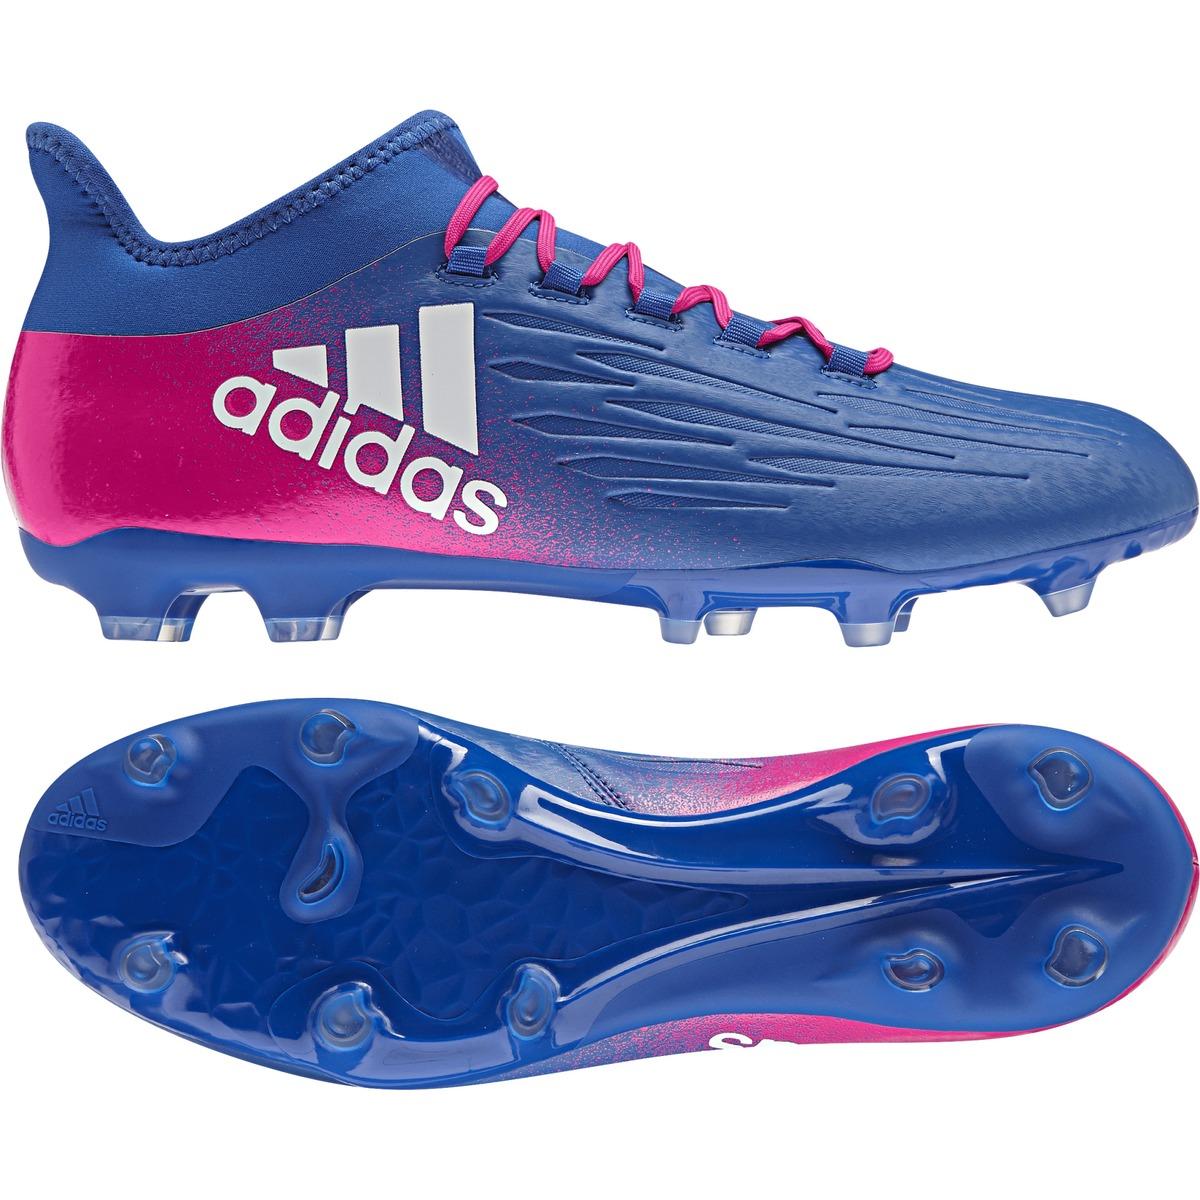 buy popular 497e8 095af adidas x 16.2 fg ag q1 fotbollssko senior fotbollsskor